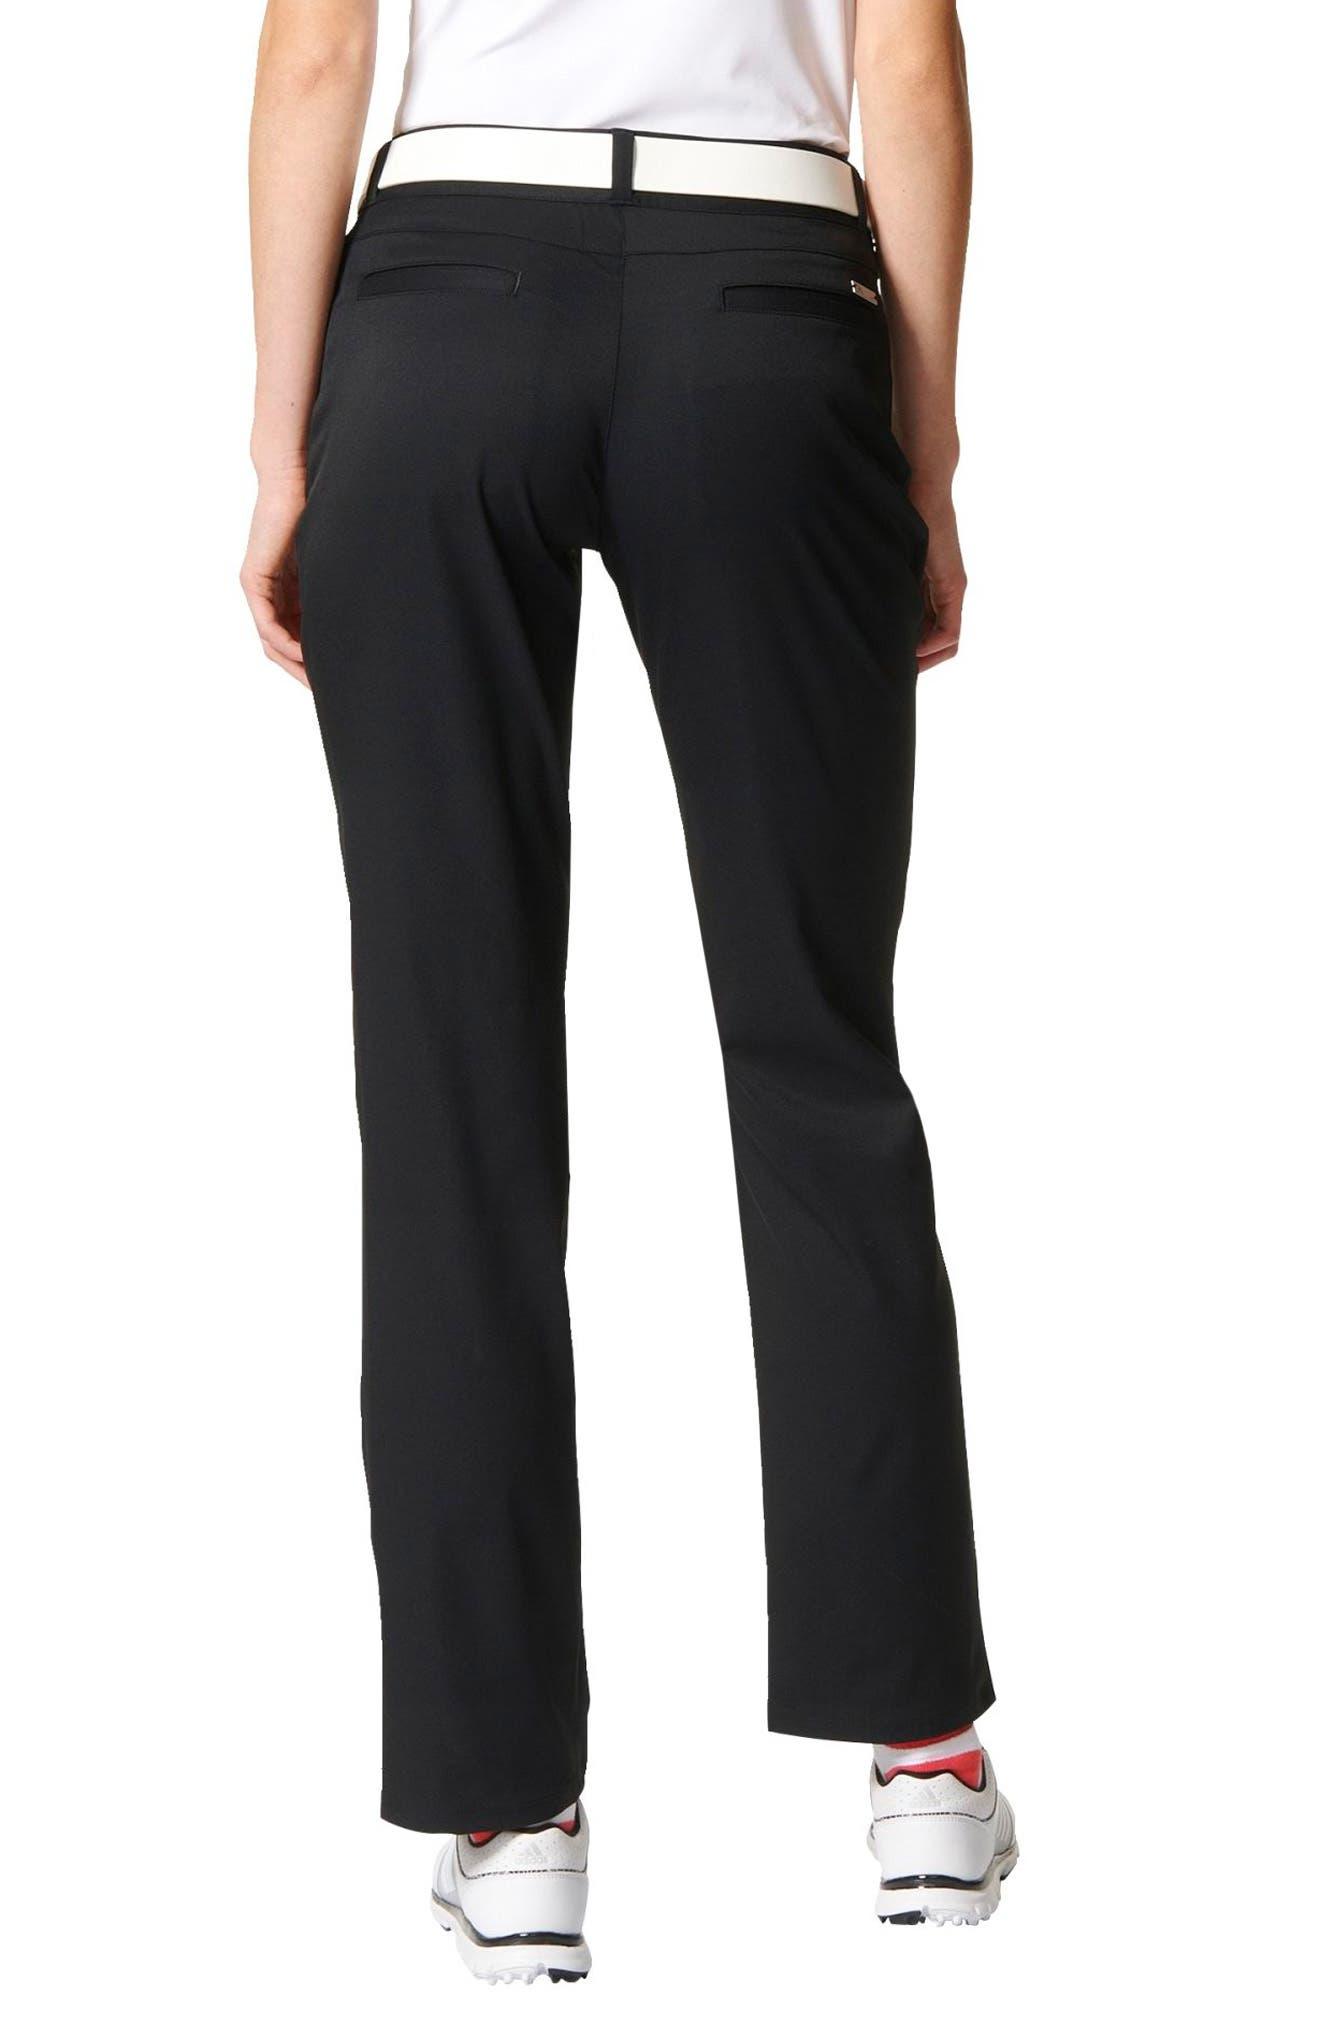 Alternate Image 2  - adidas Full Length Golf Pants